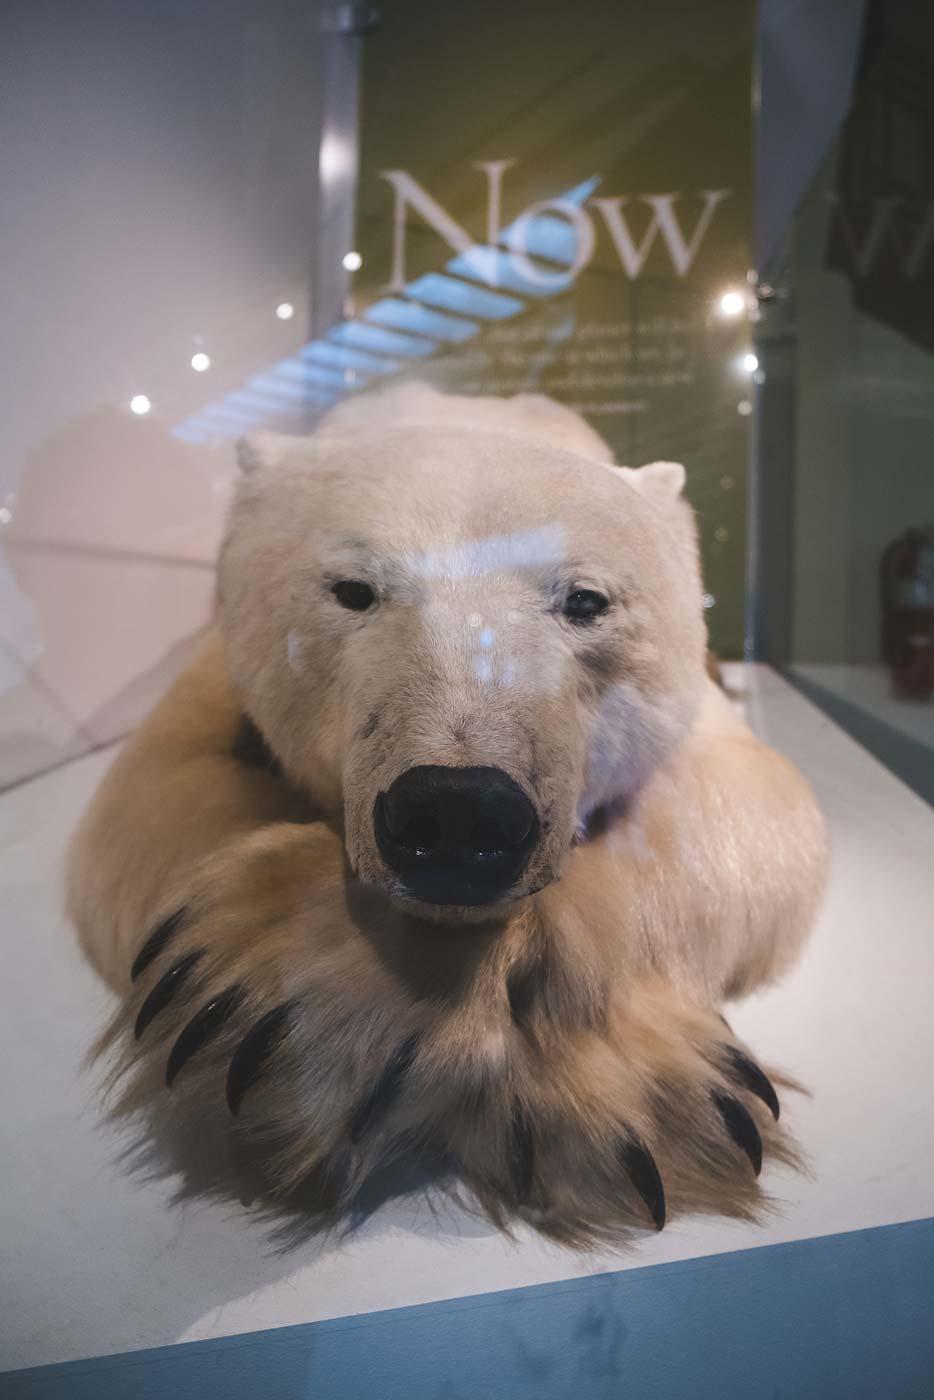 sNatural-History-Museum---Feb-2017-98.jpg